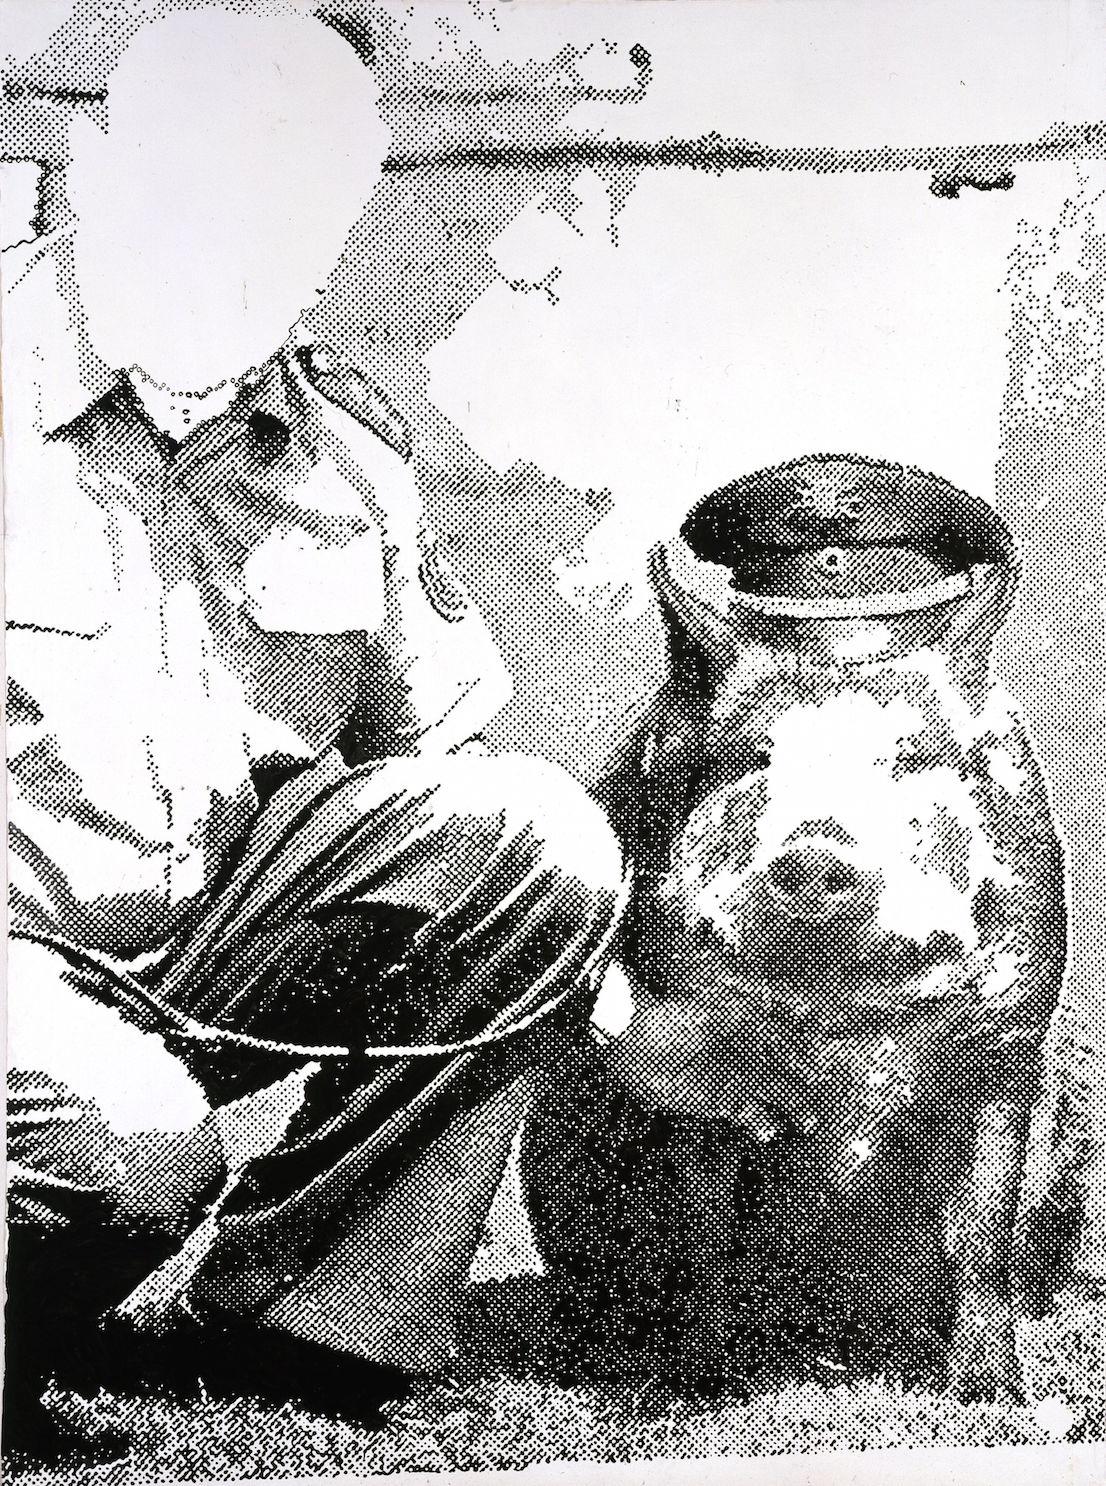 Sigmar Polke (1941 - 2010) Police Pig (Polizeischwein) 1986 © The Estate of Sigmar Polke / DACS, London / VG Bild-Kunst, Bonn